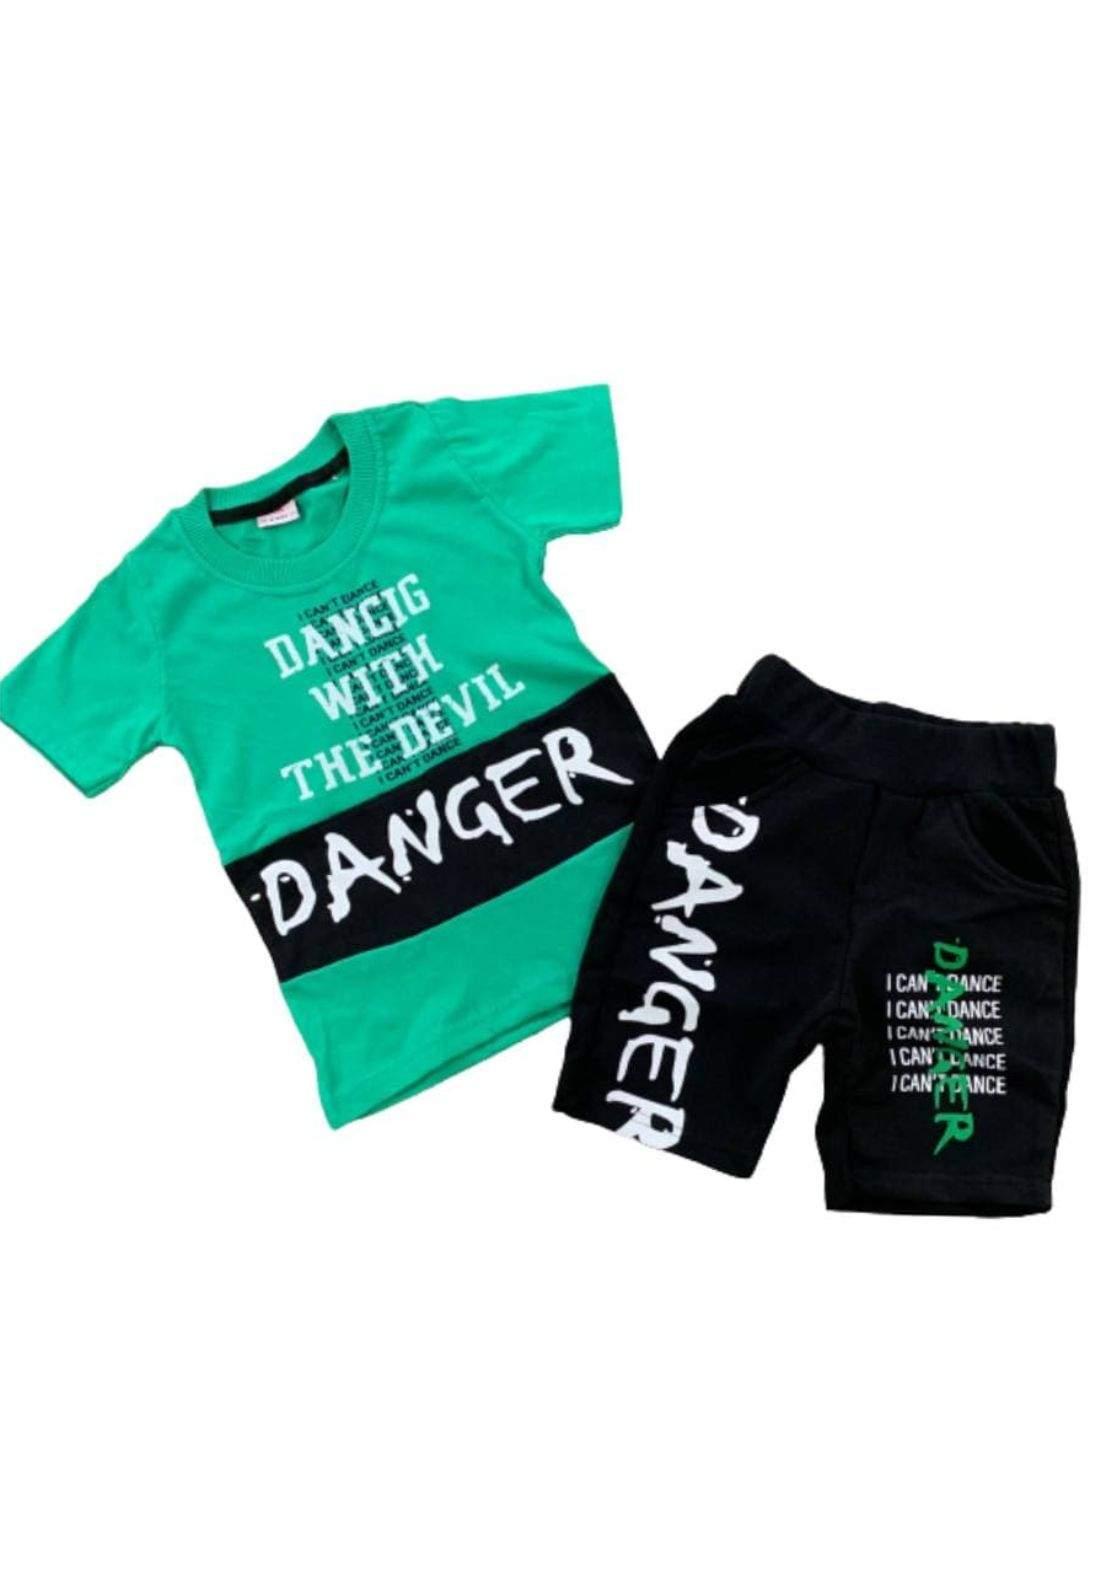 tracksuit for boys green  (t-shirt+short) ( تراكسوت ولادي  اخضر(شورت و تيشيرت